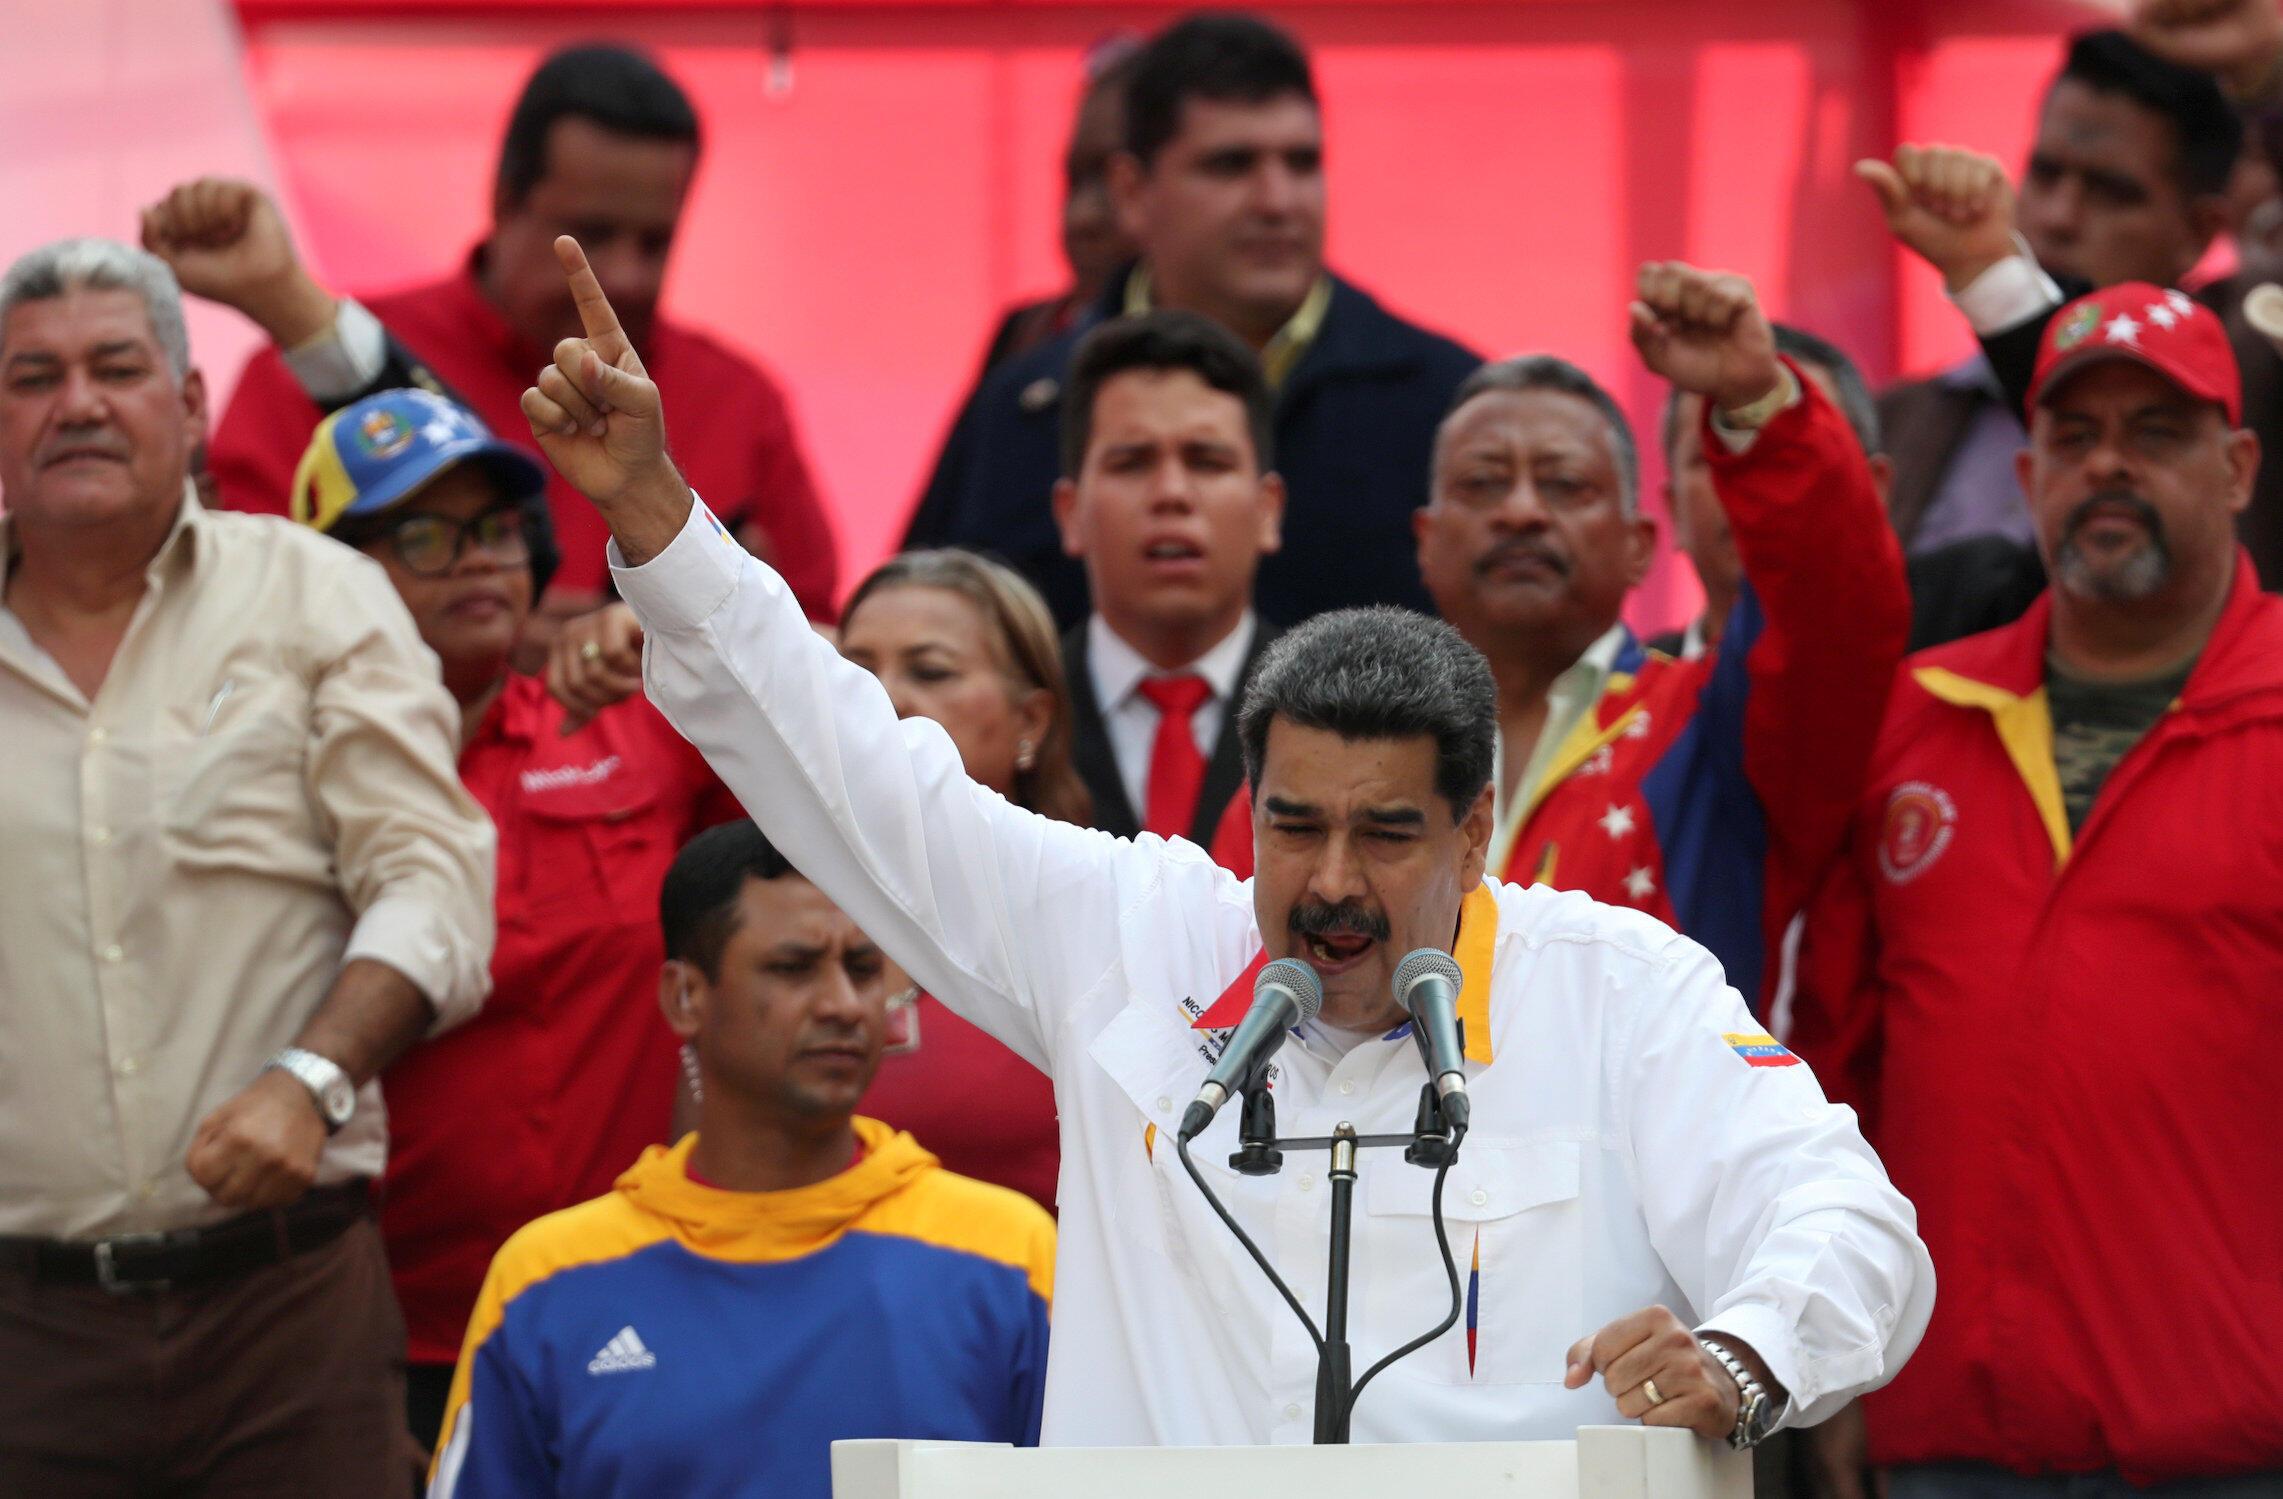 Nicolas Maduro, le 20 mai 2019, à Caracas. (Photo d'illustration)